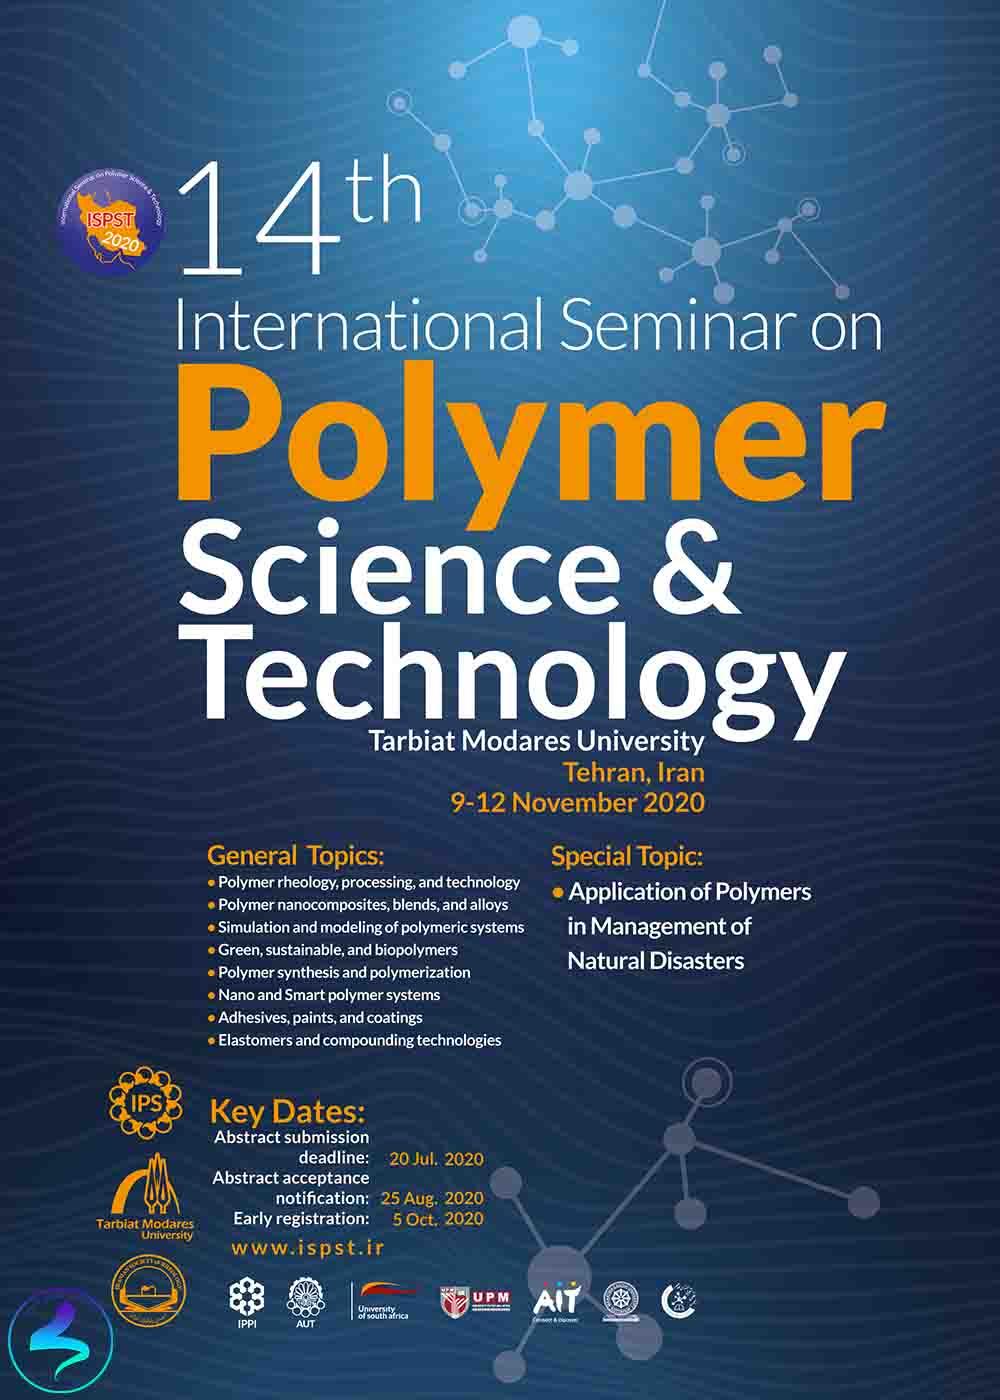 چهاردهمین سمینار بینالمللی «علوم و تکنولوژی پلیمر»